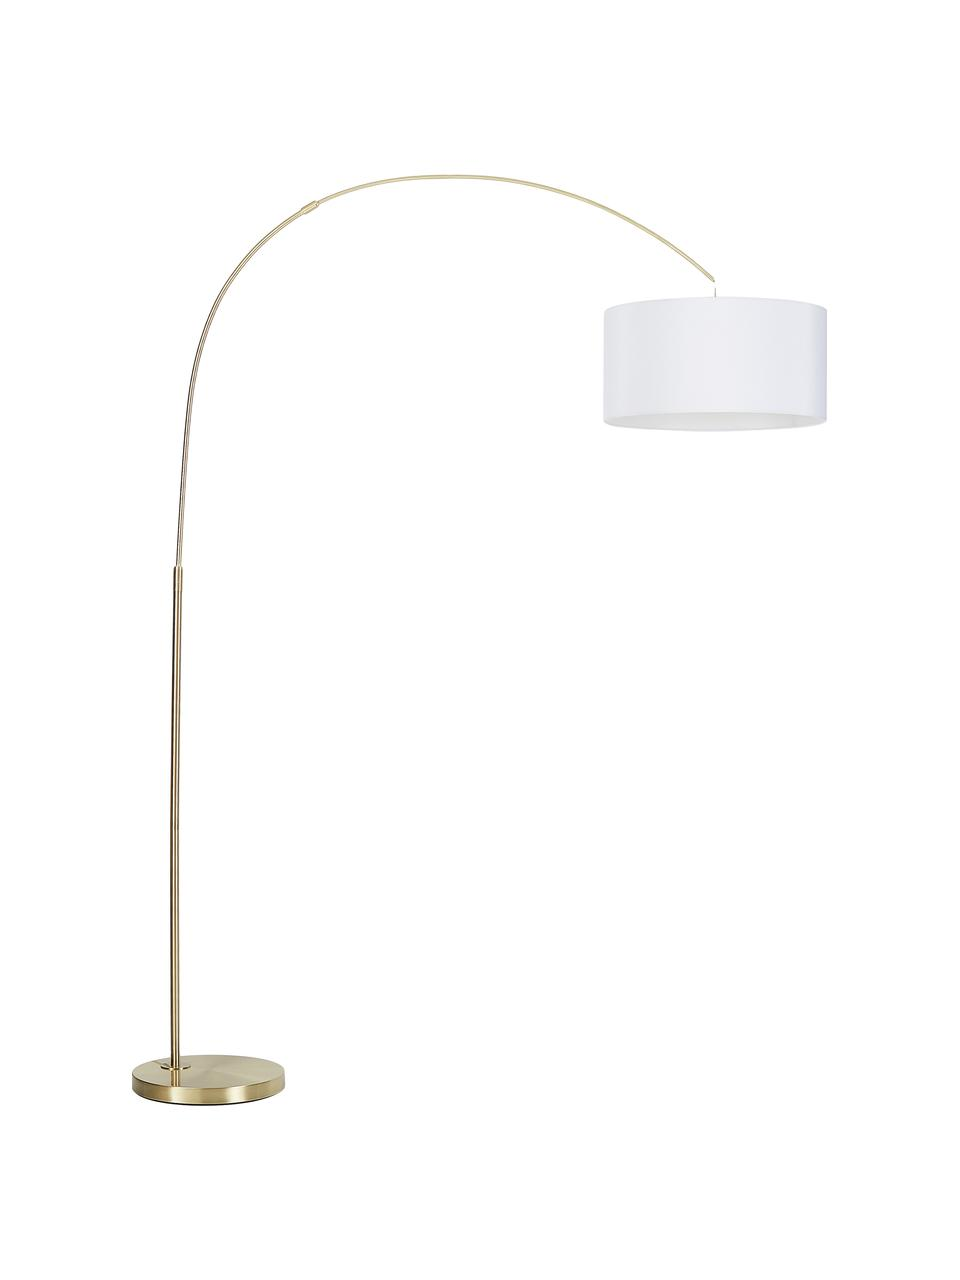 Lámpara arco Niels, estilo moderno, Pantalla: mezcla de algodón, Cable: plástico, Blanco, latón, An 157 x Al 218 cm